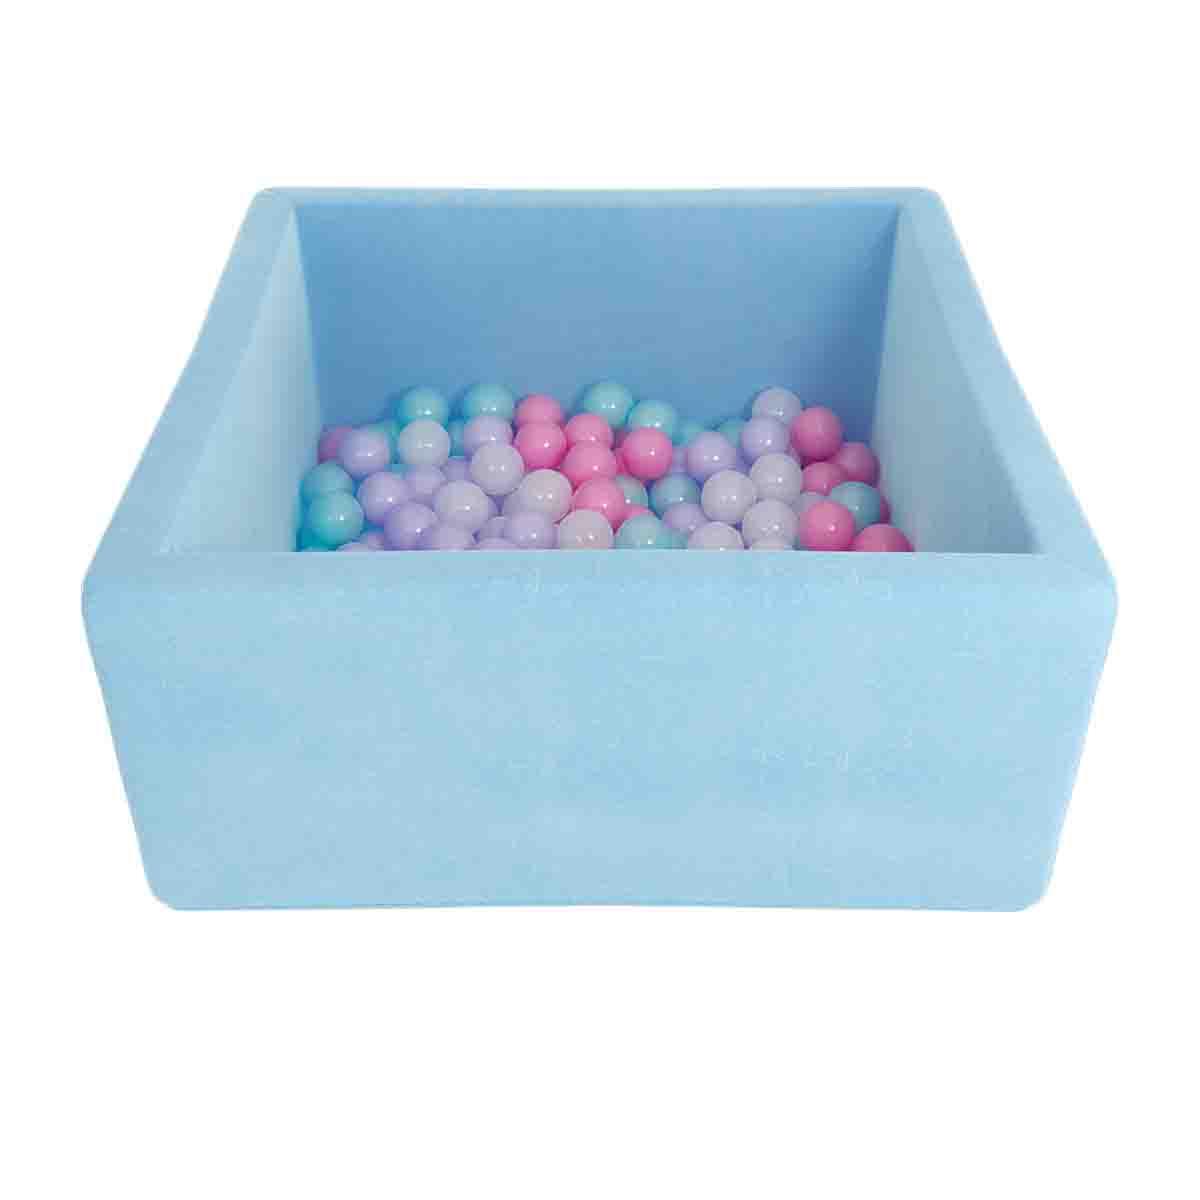 Купить Детский сухой бассейн Romana Airpool Box, голубой + 300 шаров, Romana (Романа)